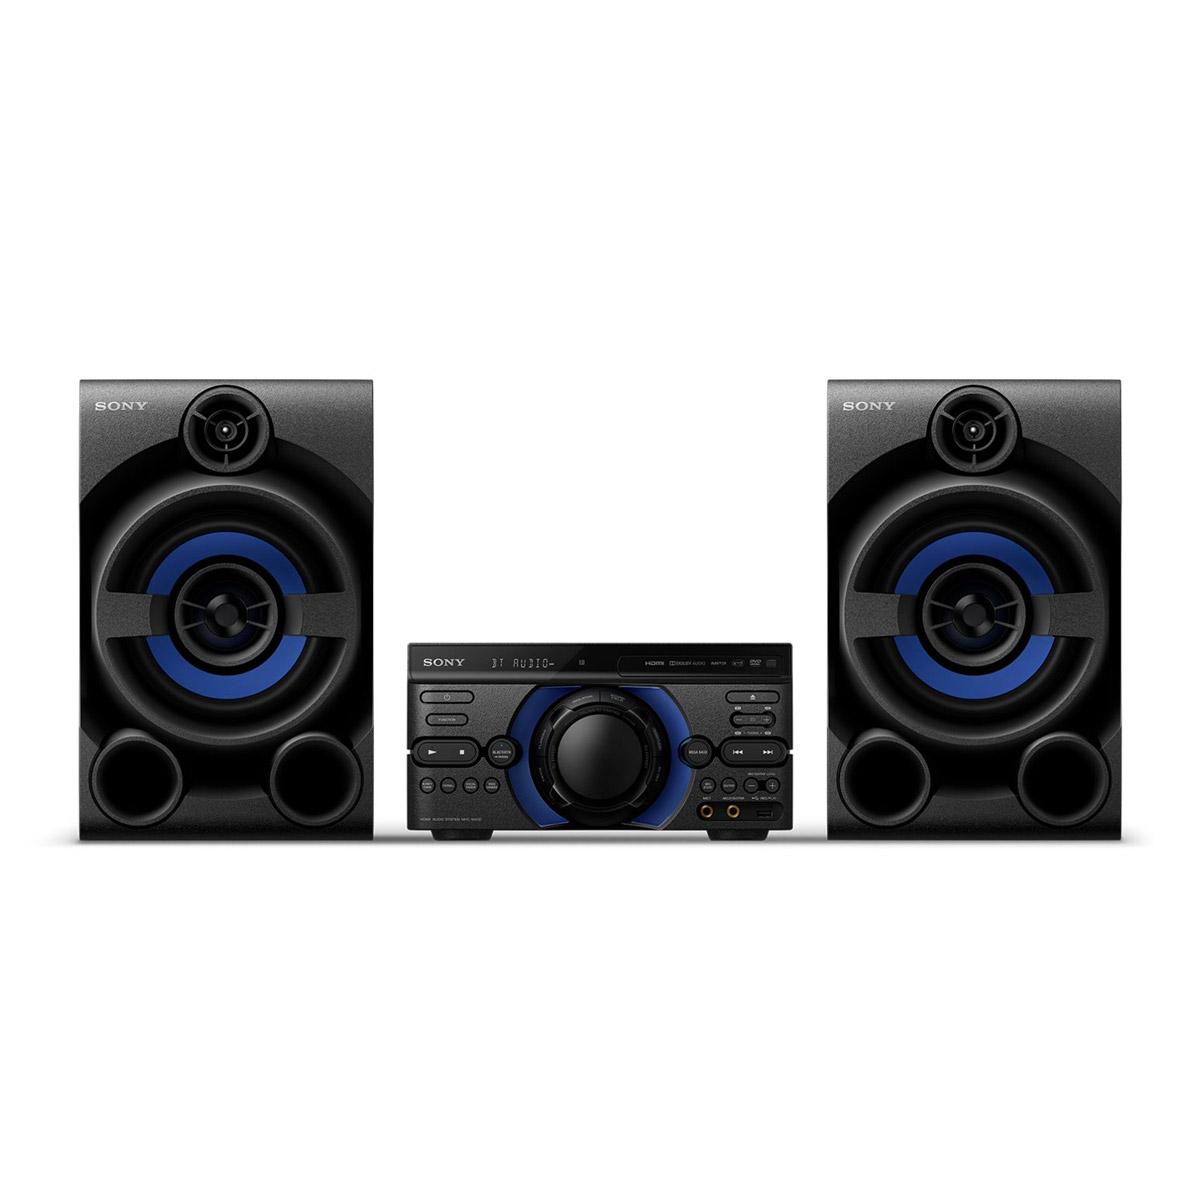 buy sony audio hi fi system with dvd karaoke model mhc. Black Bedroom Furniture Sets. Home Design Ideas